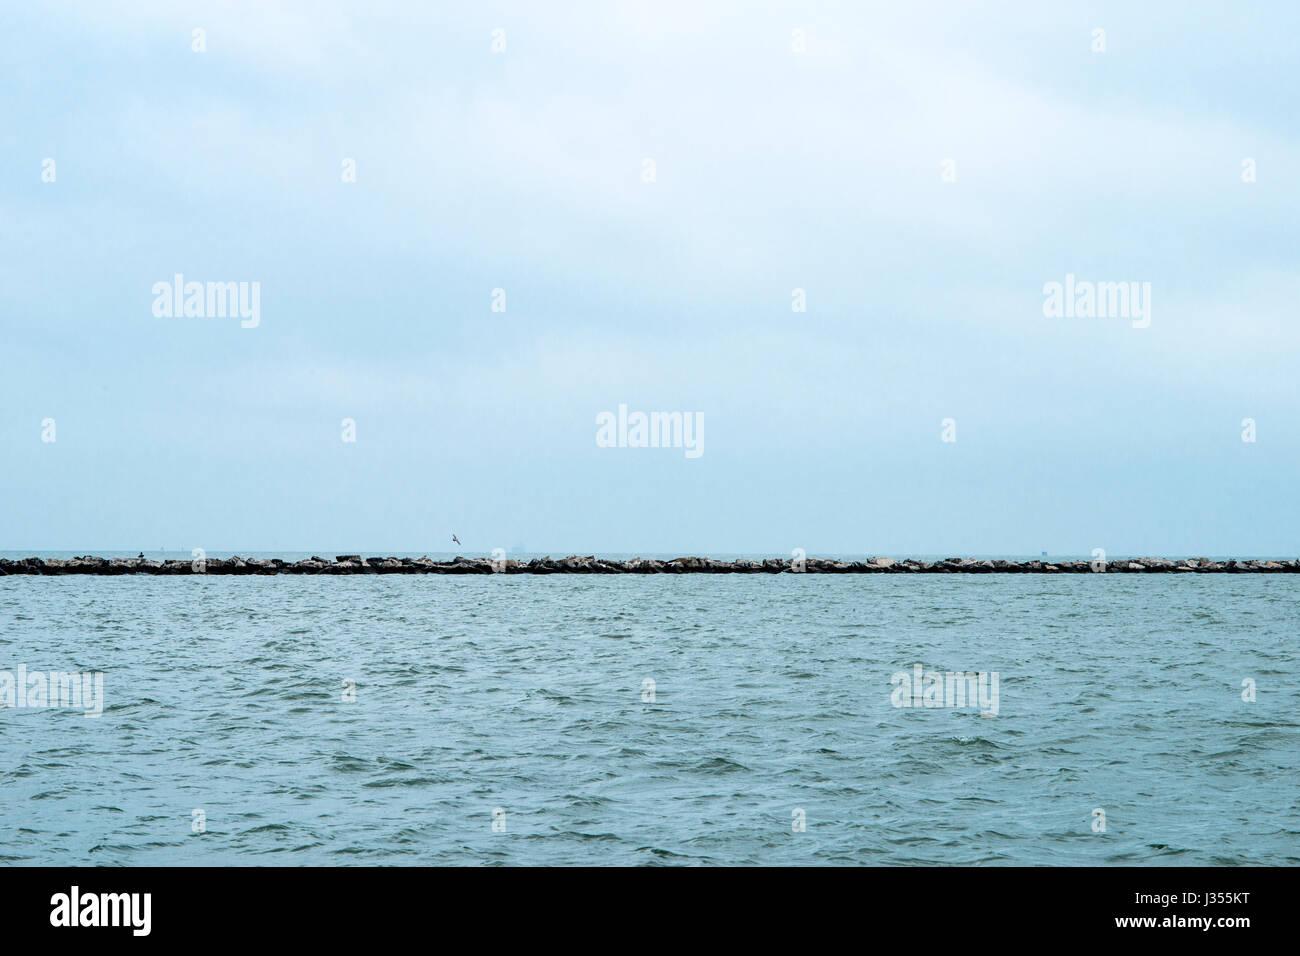 Horizon of Gulf of Mexico from Corpus Christi, TX - Stock Image